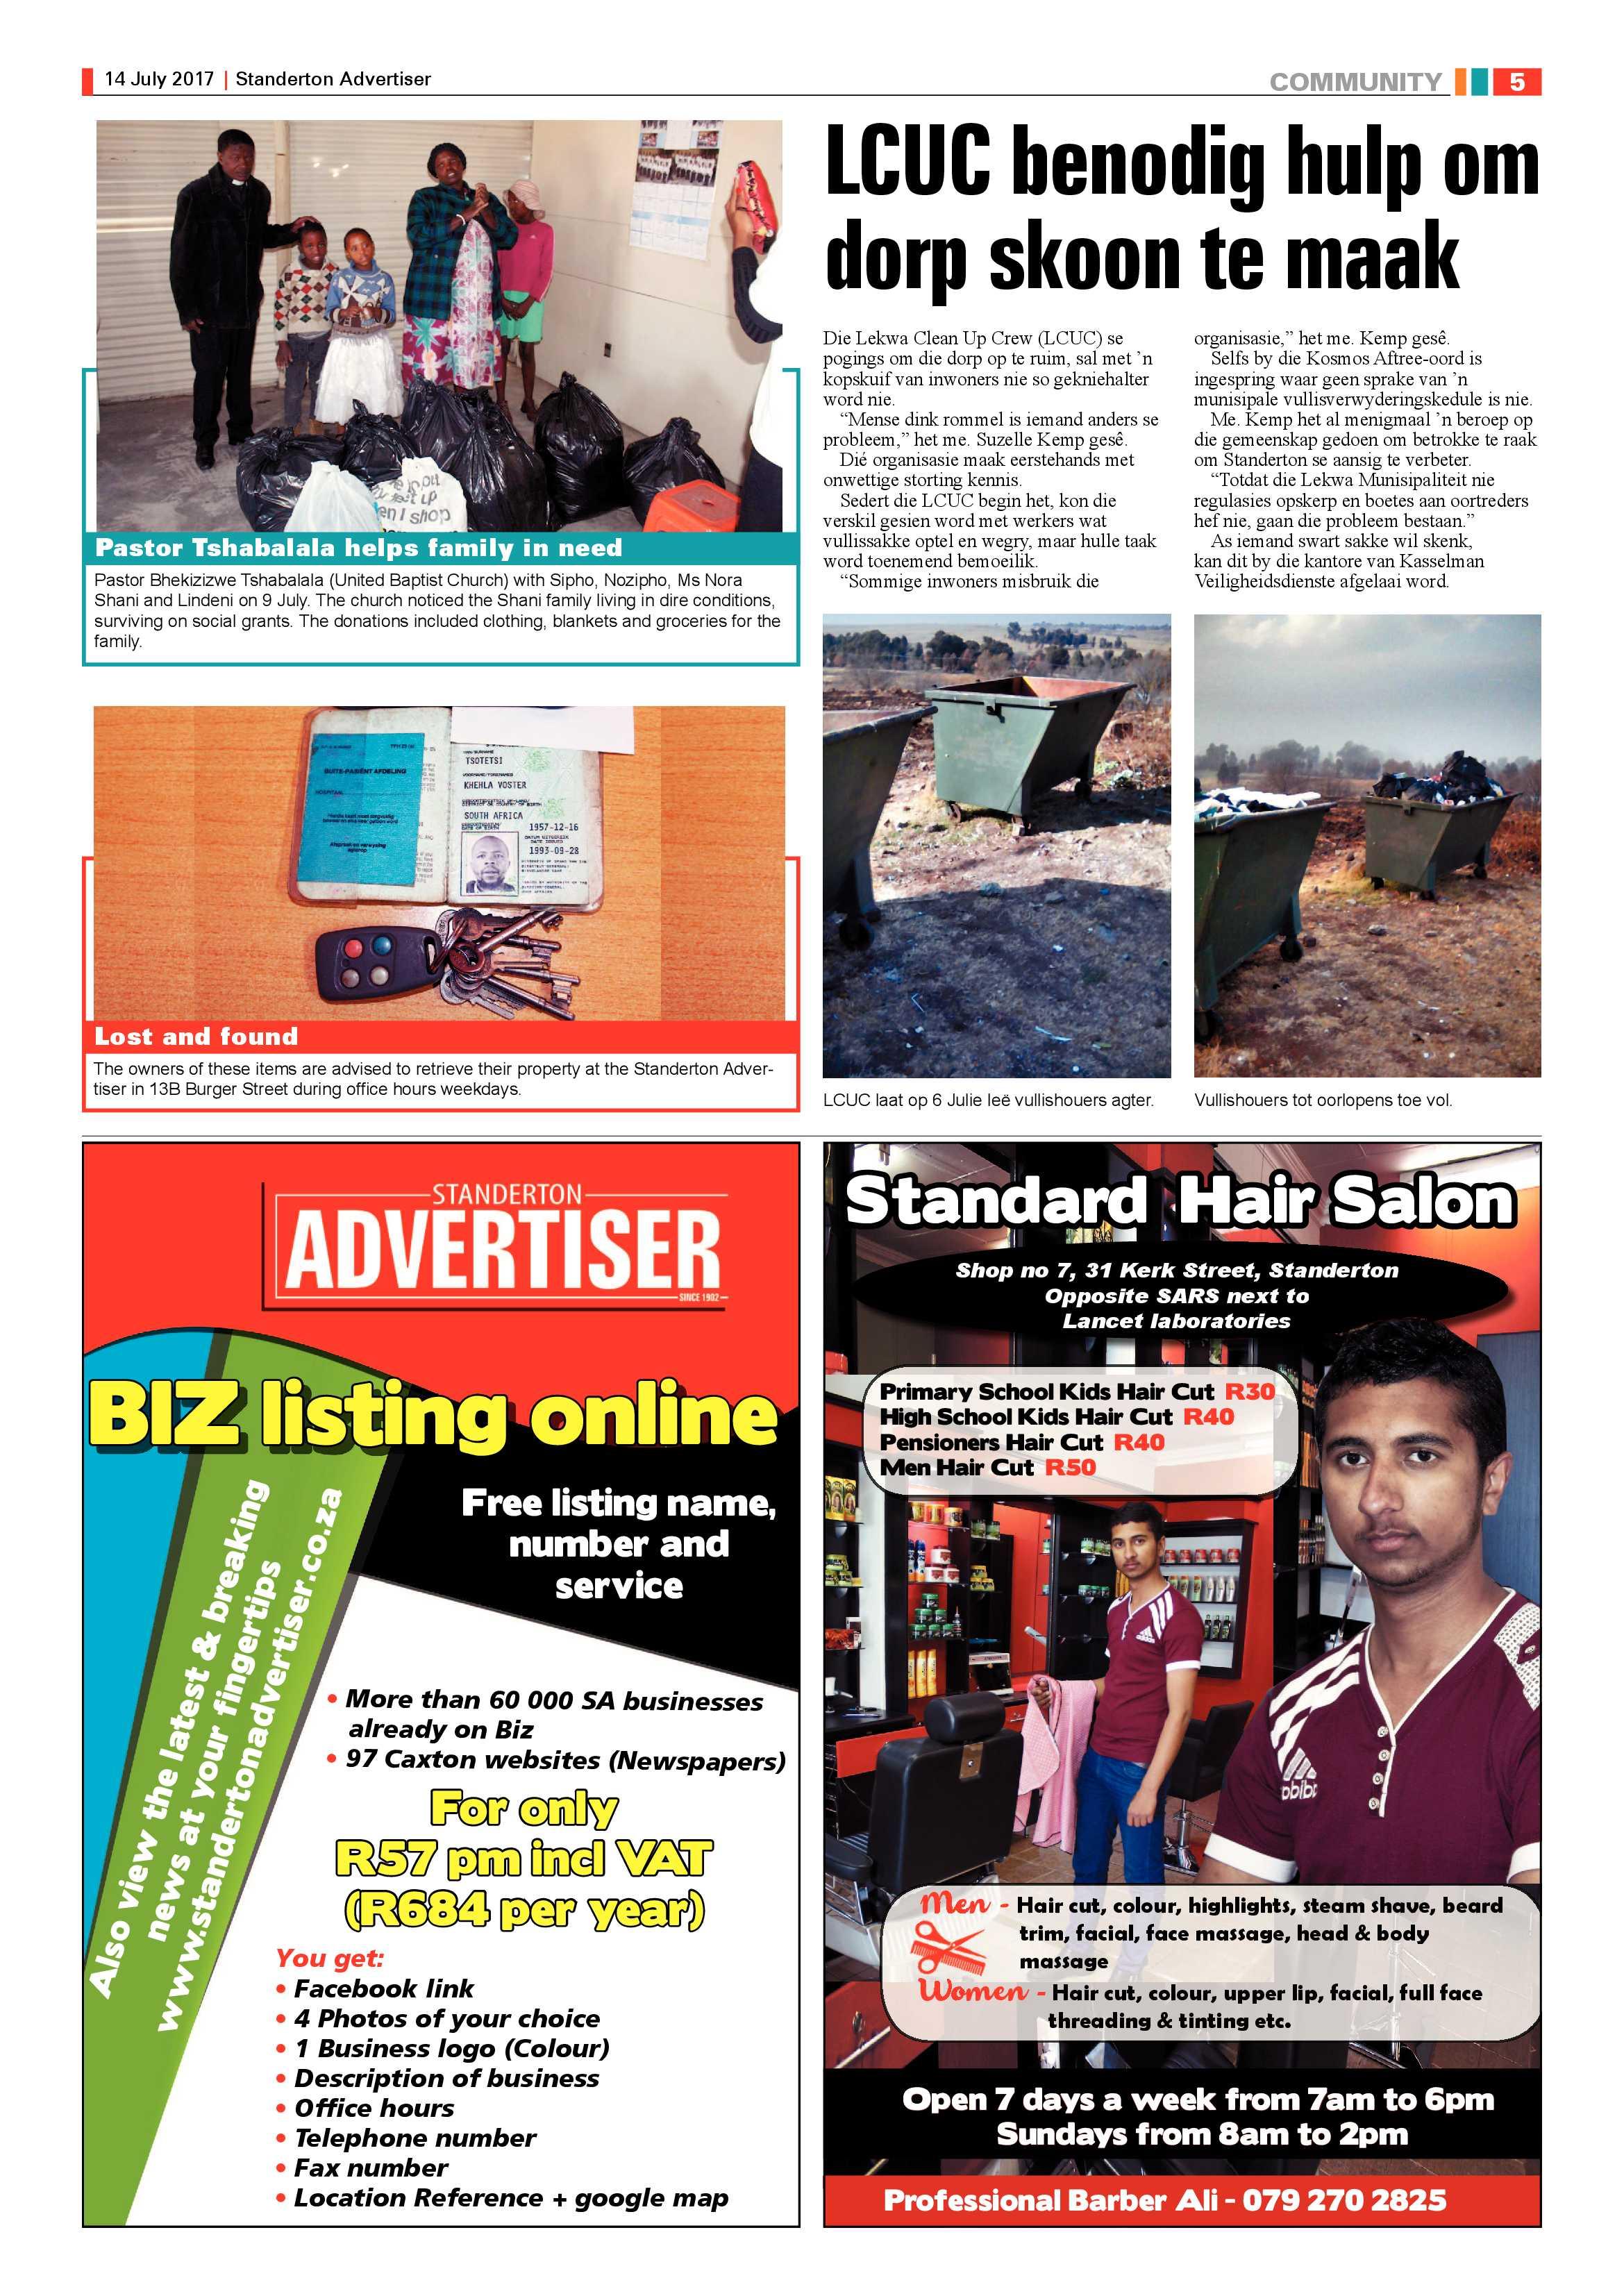 standerton-advertiser-14-july-2017-epapers-page-5